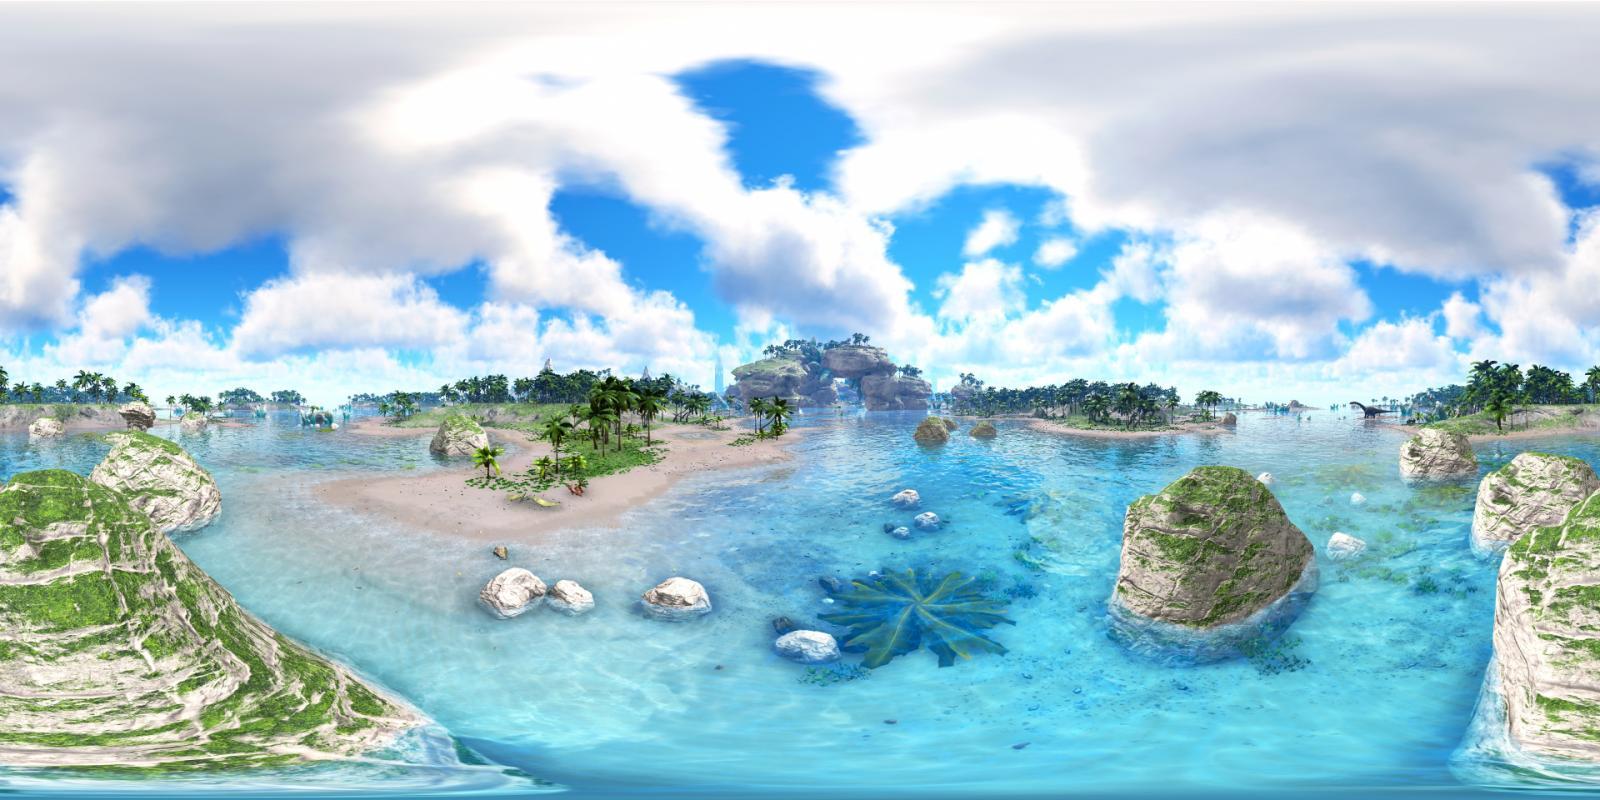 large.58f17d4cf012d_WolfAngelus-Paradise-360sta.jpg